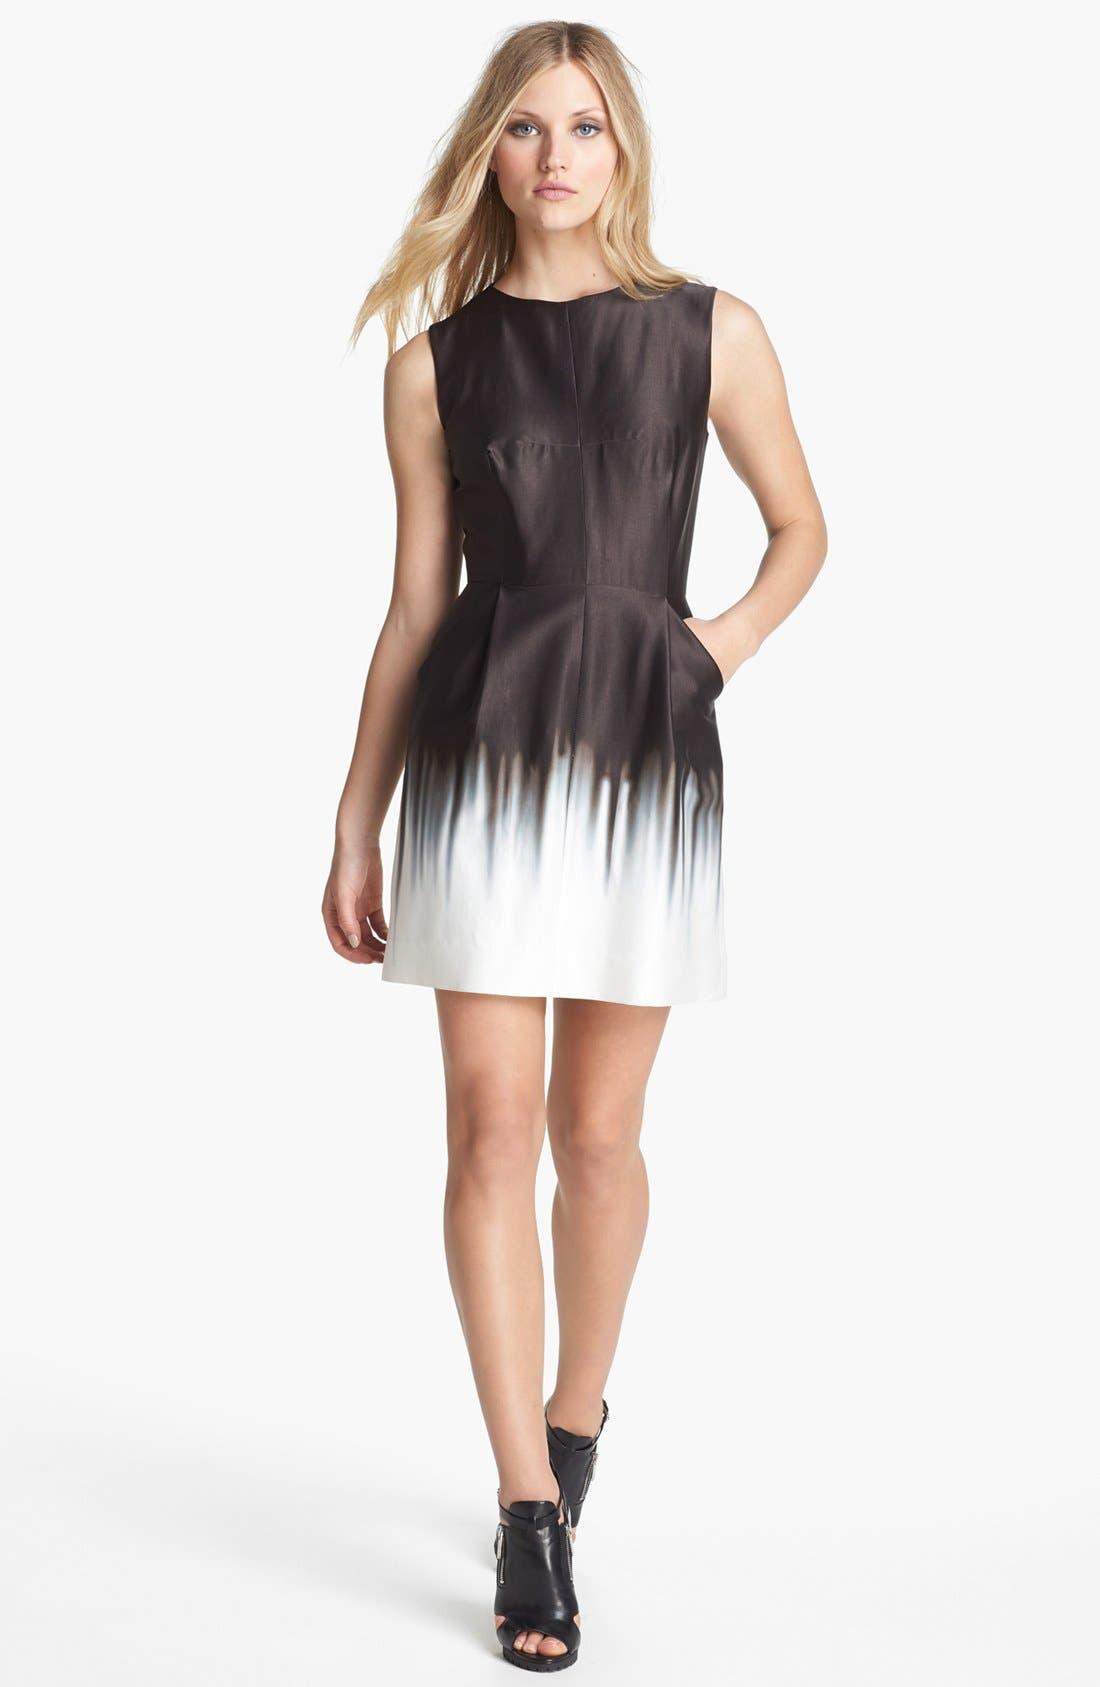 MILLY,                             'Coco' Print Sheath Dress,                             Main thumbnail 1, color,                             150